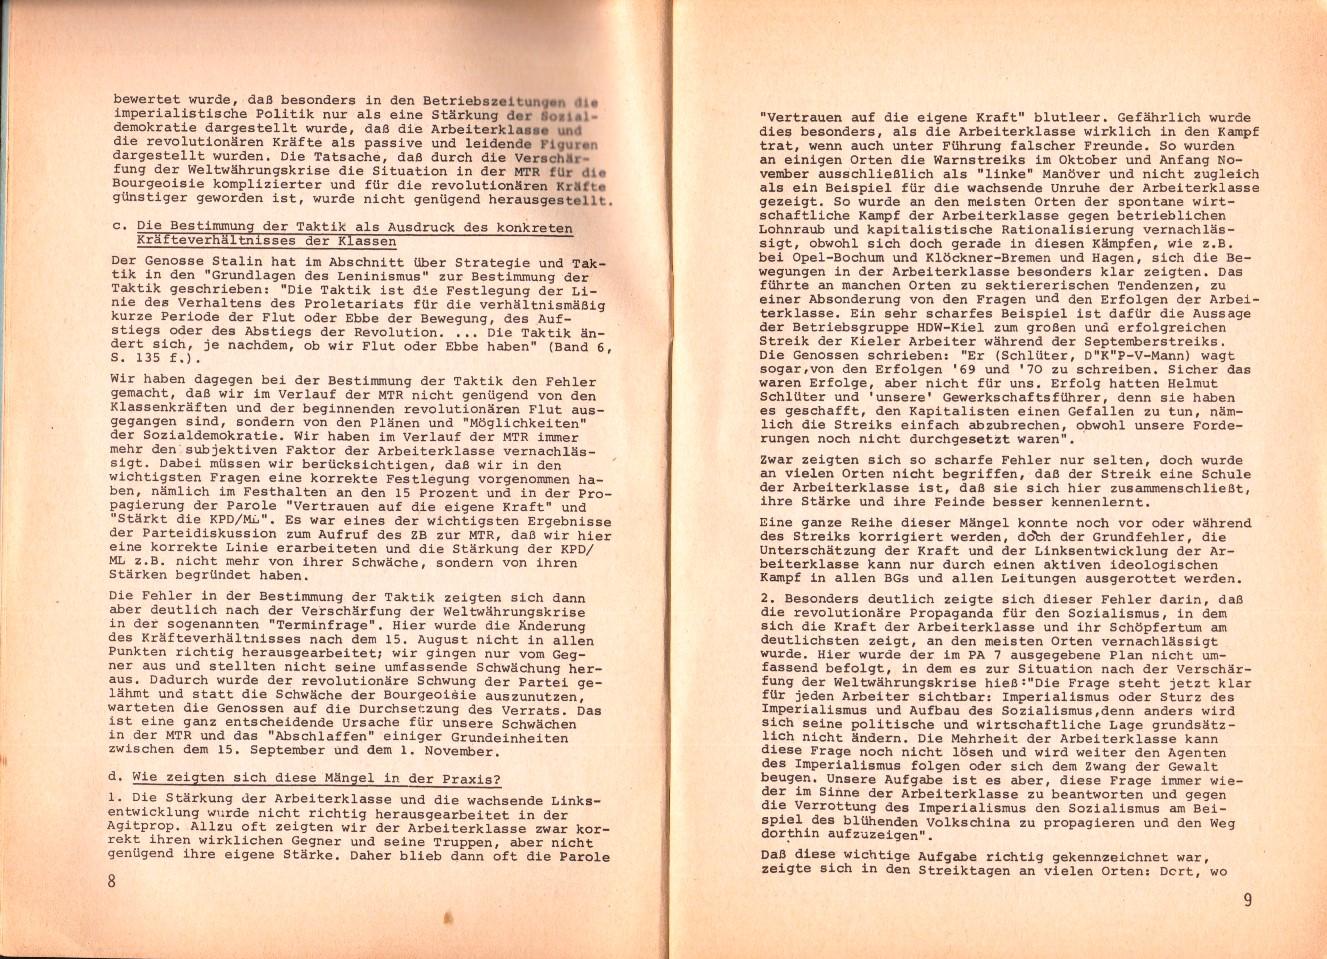 ZB_Parteiarbeiter_1971_10_06